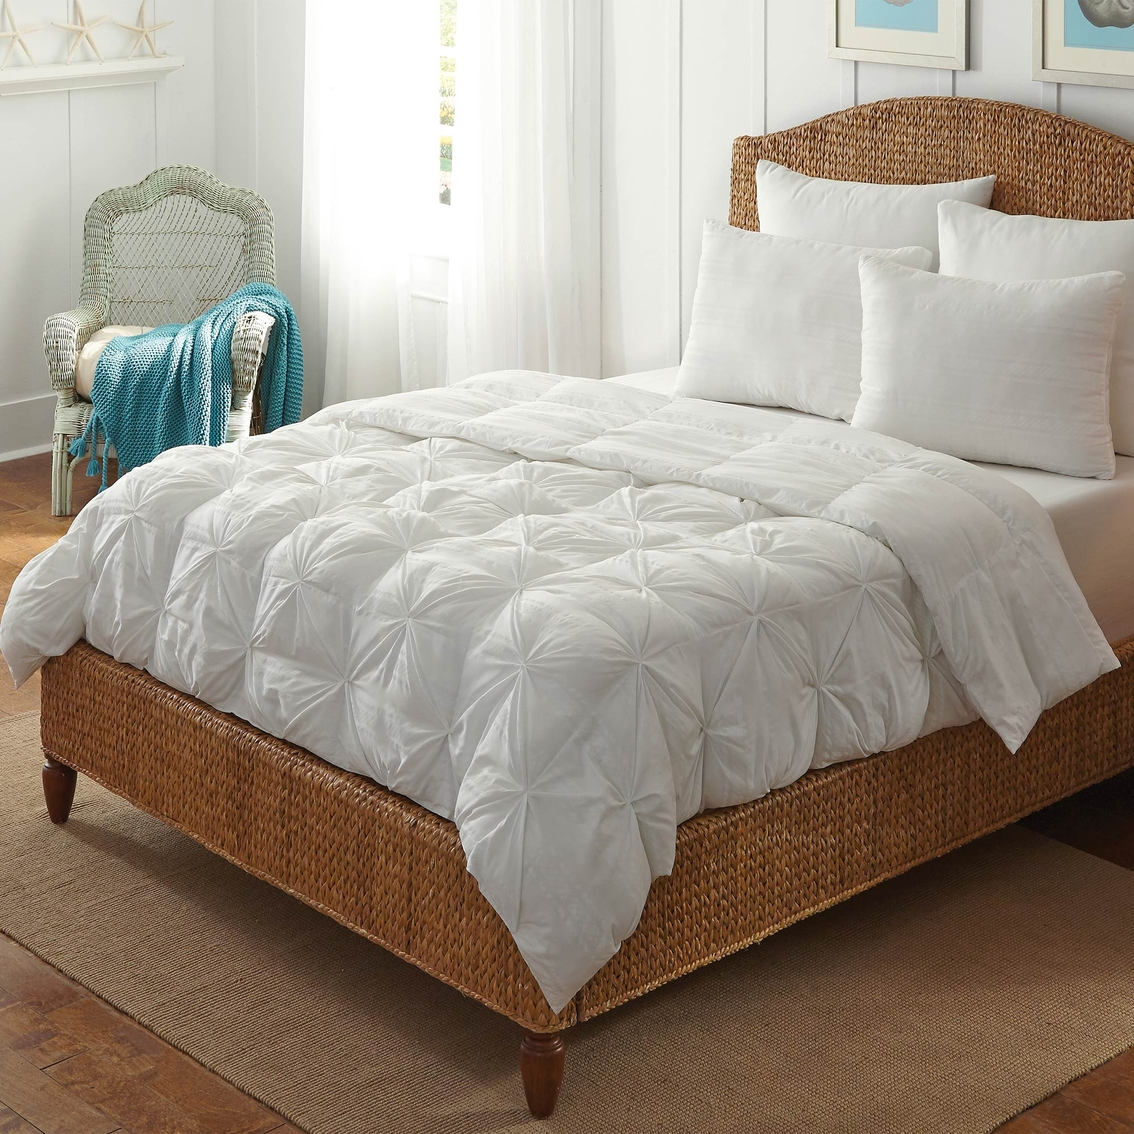 Rio home fashions tufted down alternative comforter down - Home design down alternative comforter ...